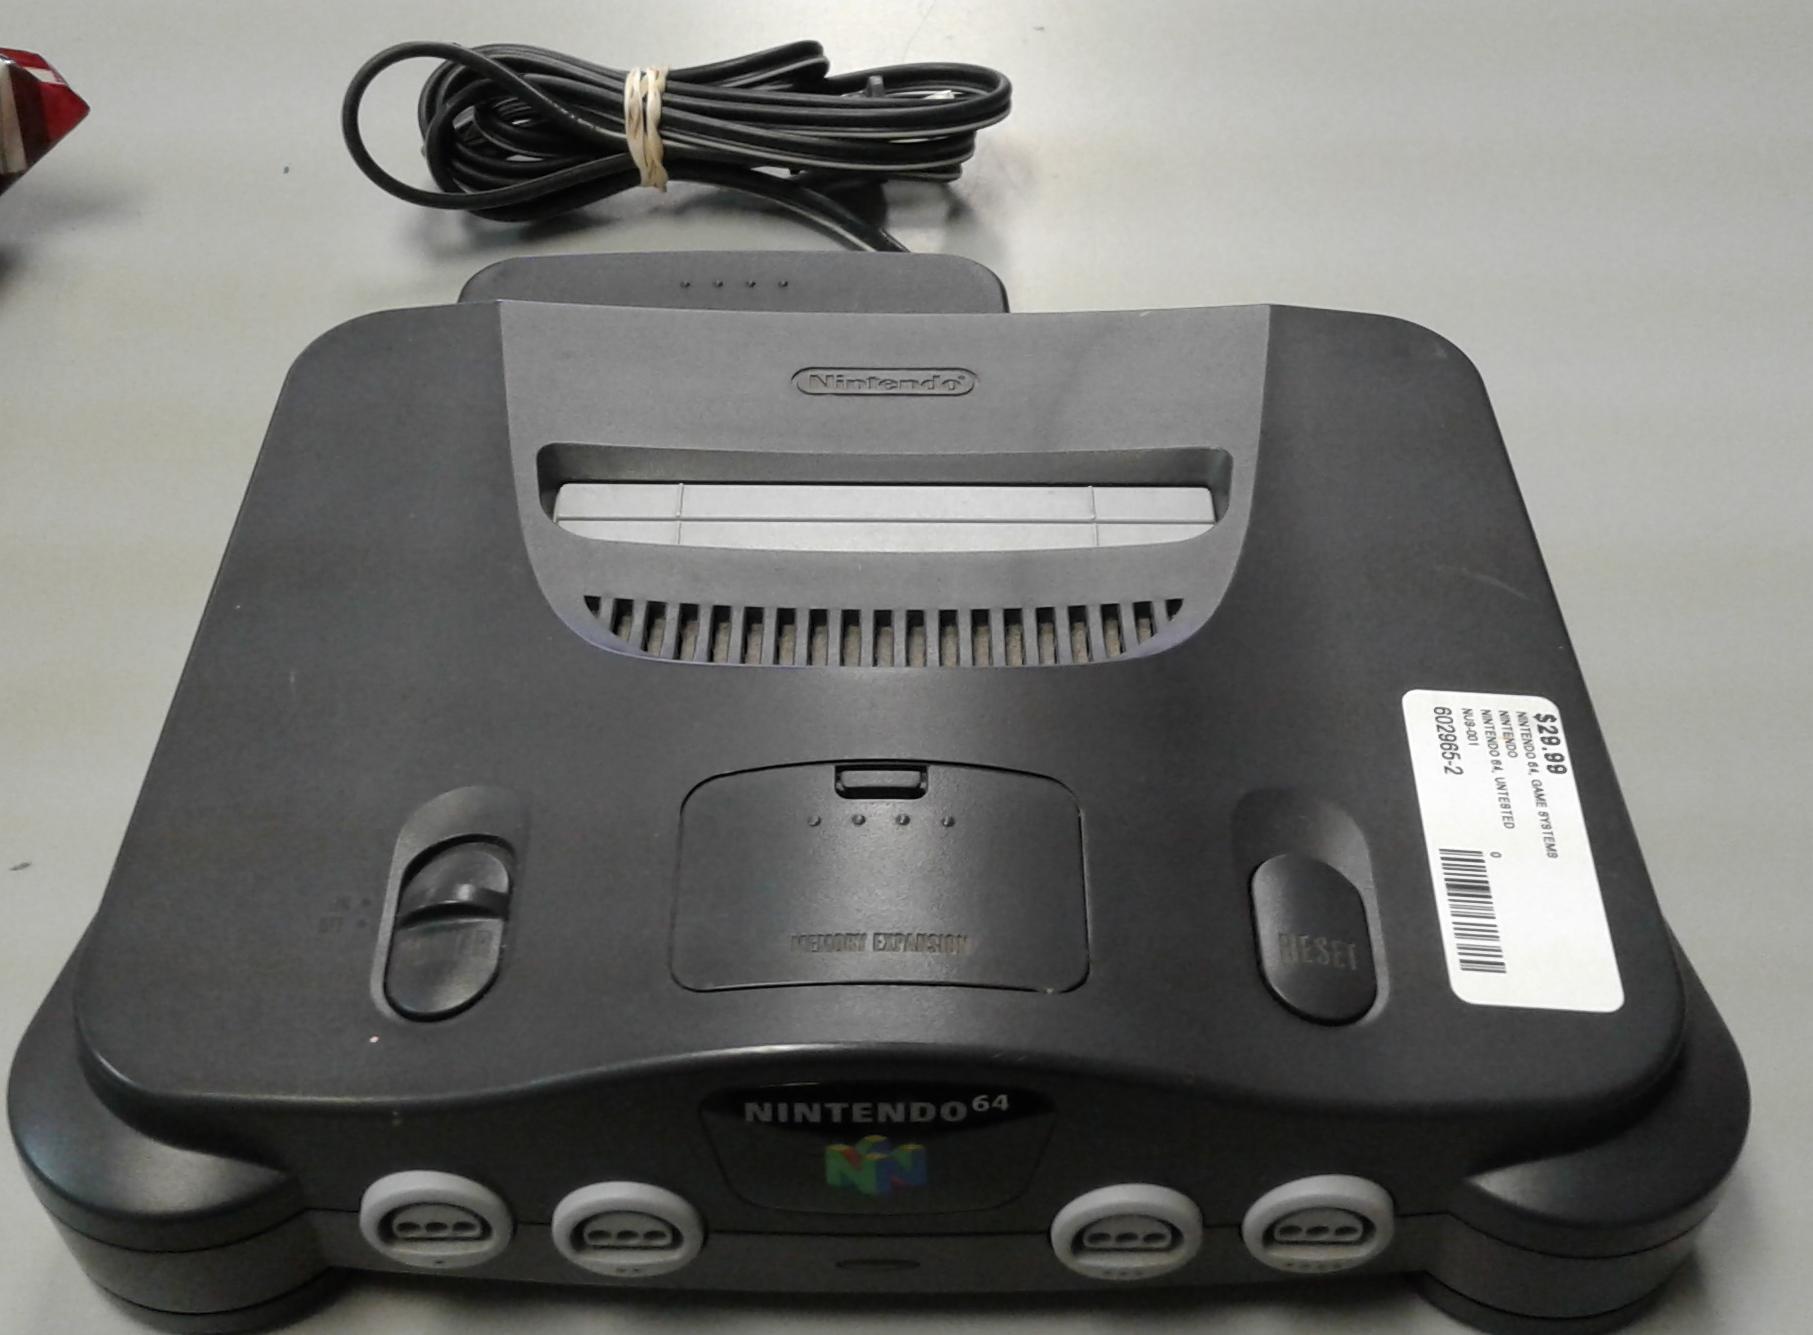 NINTENDO NUS-001 NINTENDO 64 GAME SYSTEM